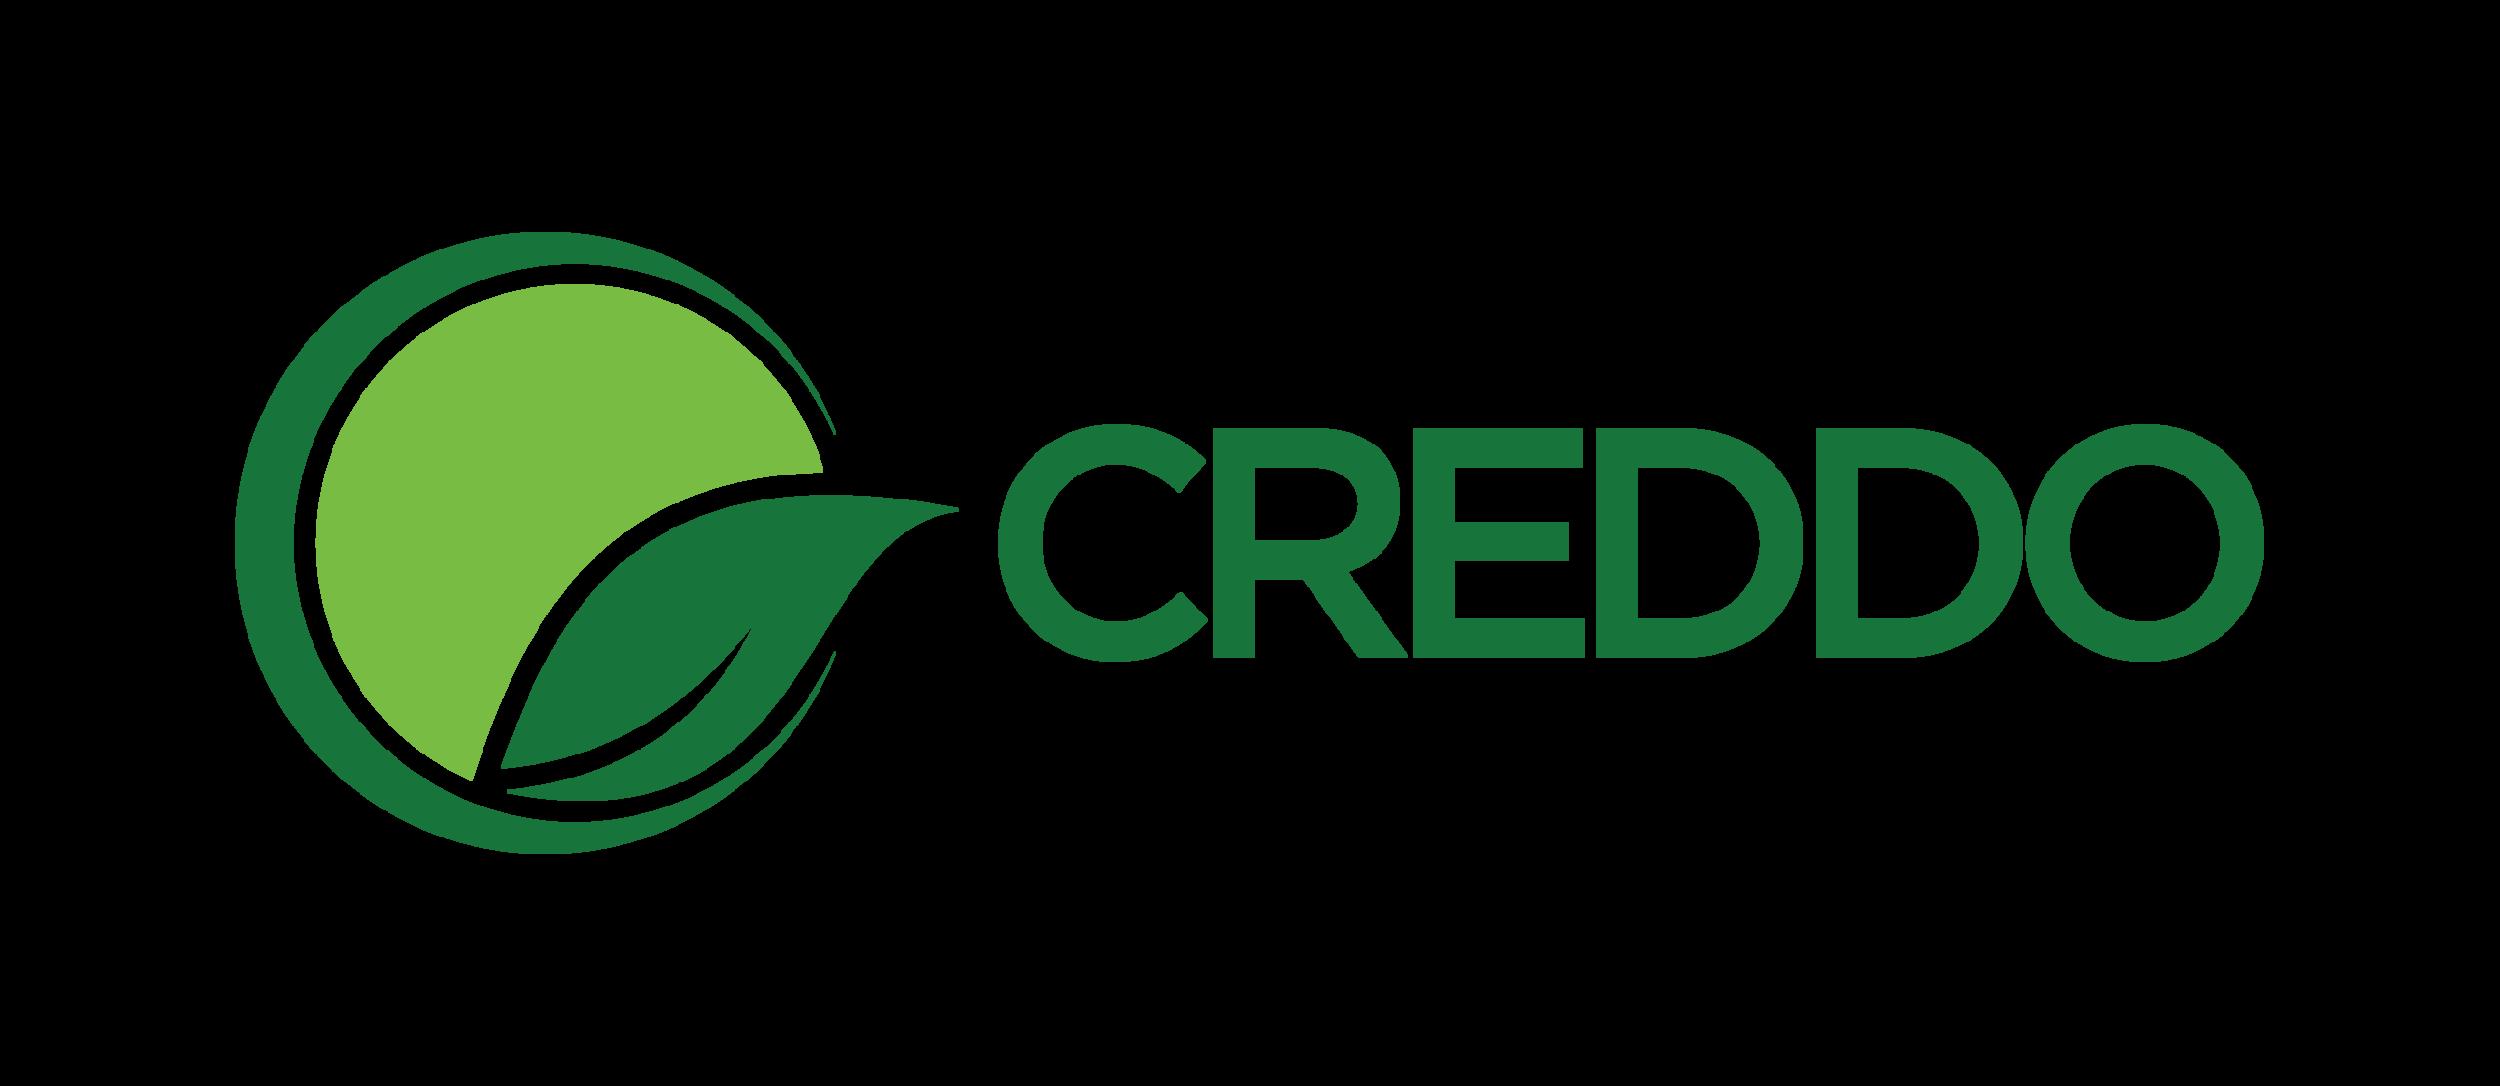 Creddo Logo H - rgb (1).png